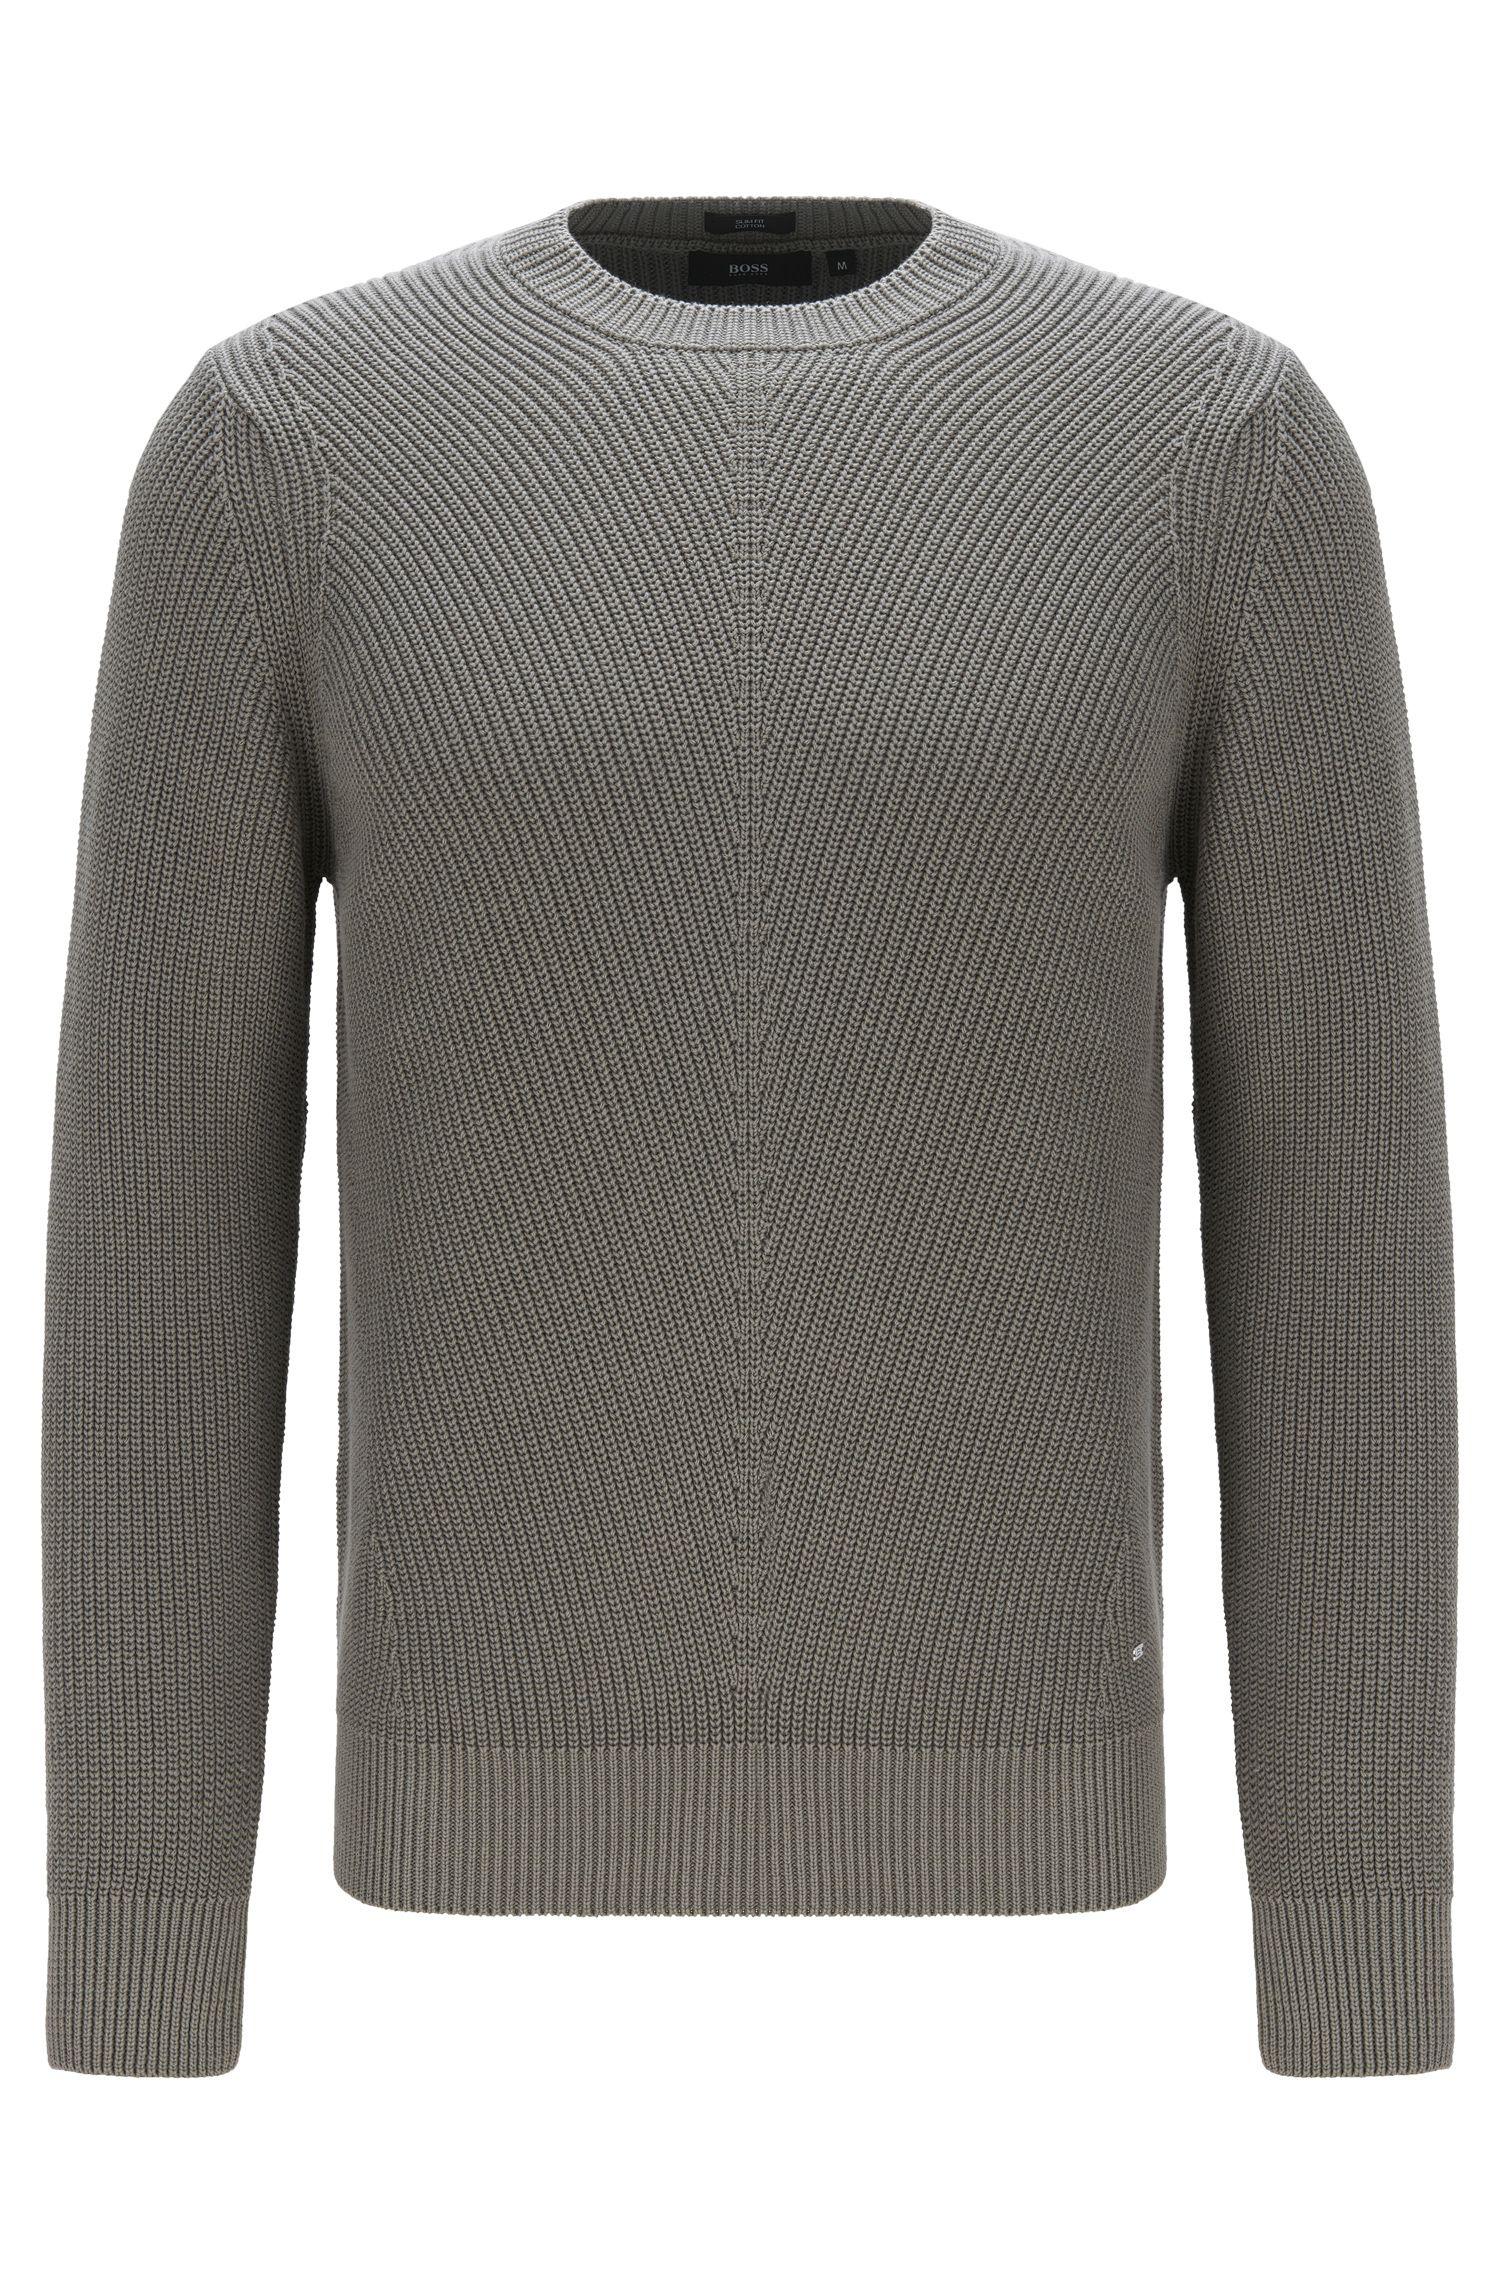 Unifarbener Slim-Fit Pullover aus Baumwolle: 'Odrigo'